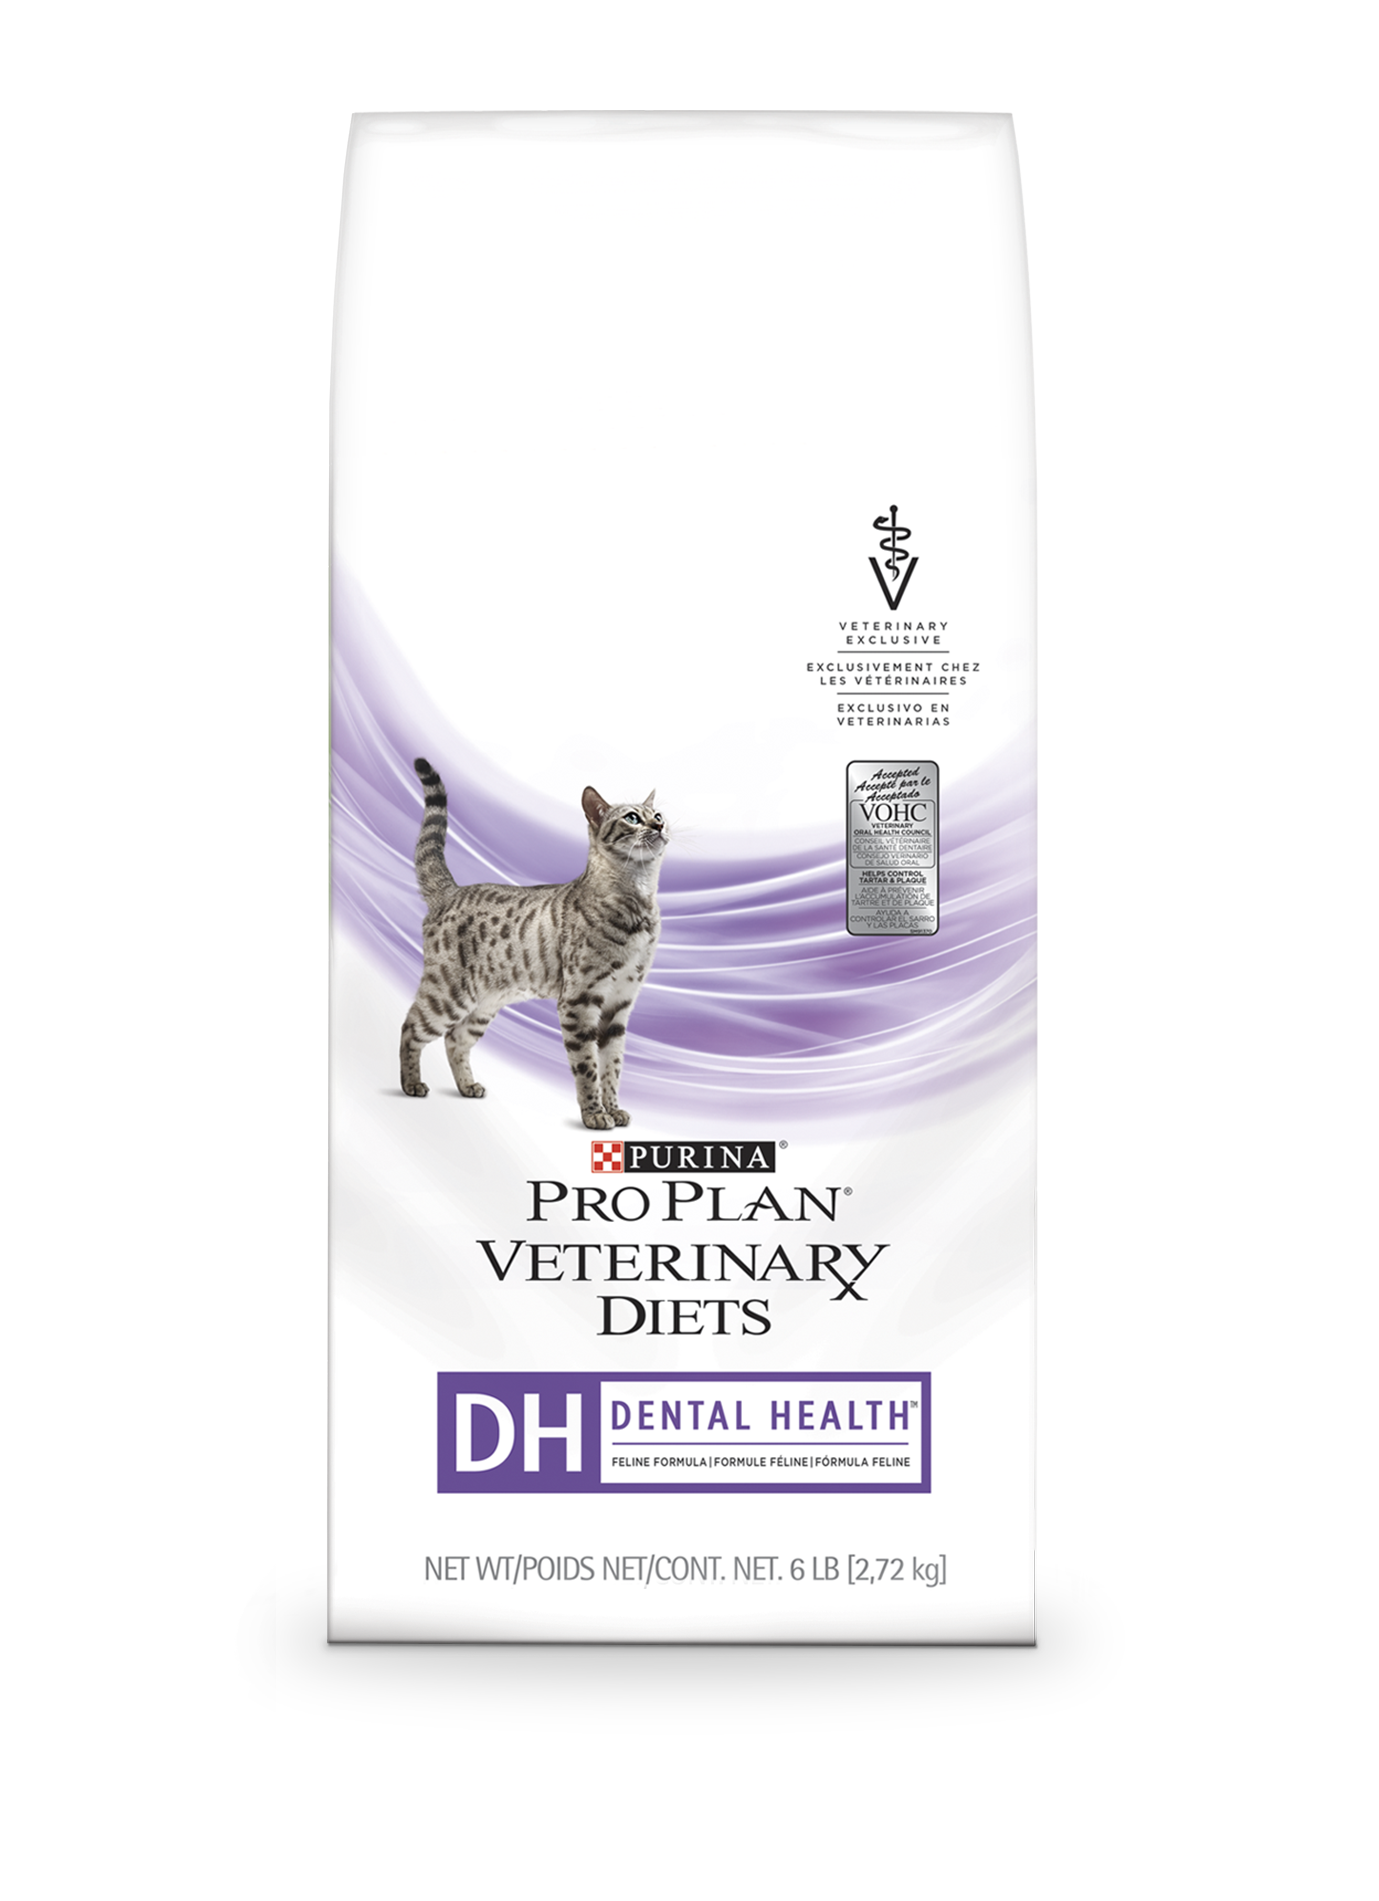 Dh Dental Health Cat Food Purina Pro Plan Dry Cat Food Purina